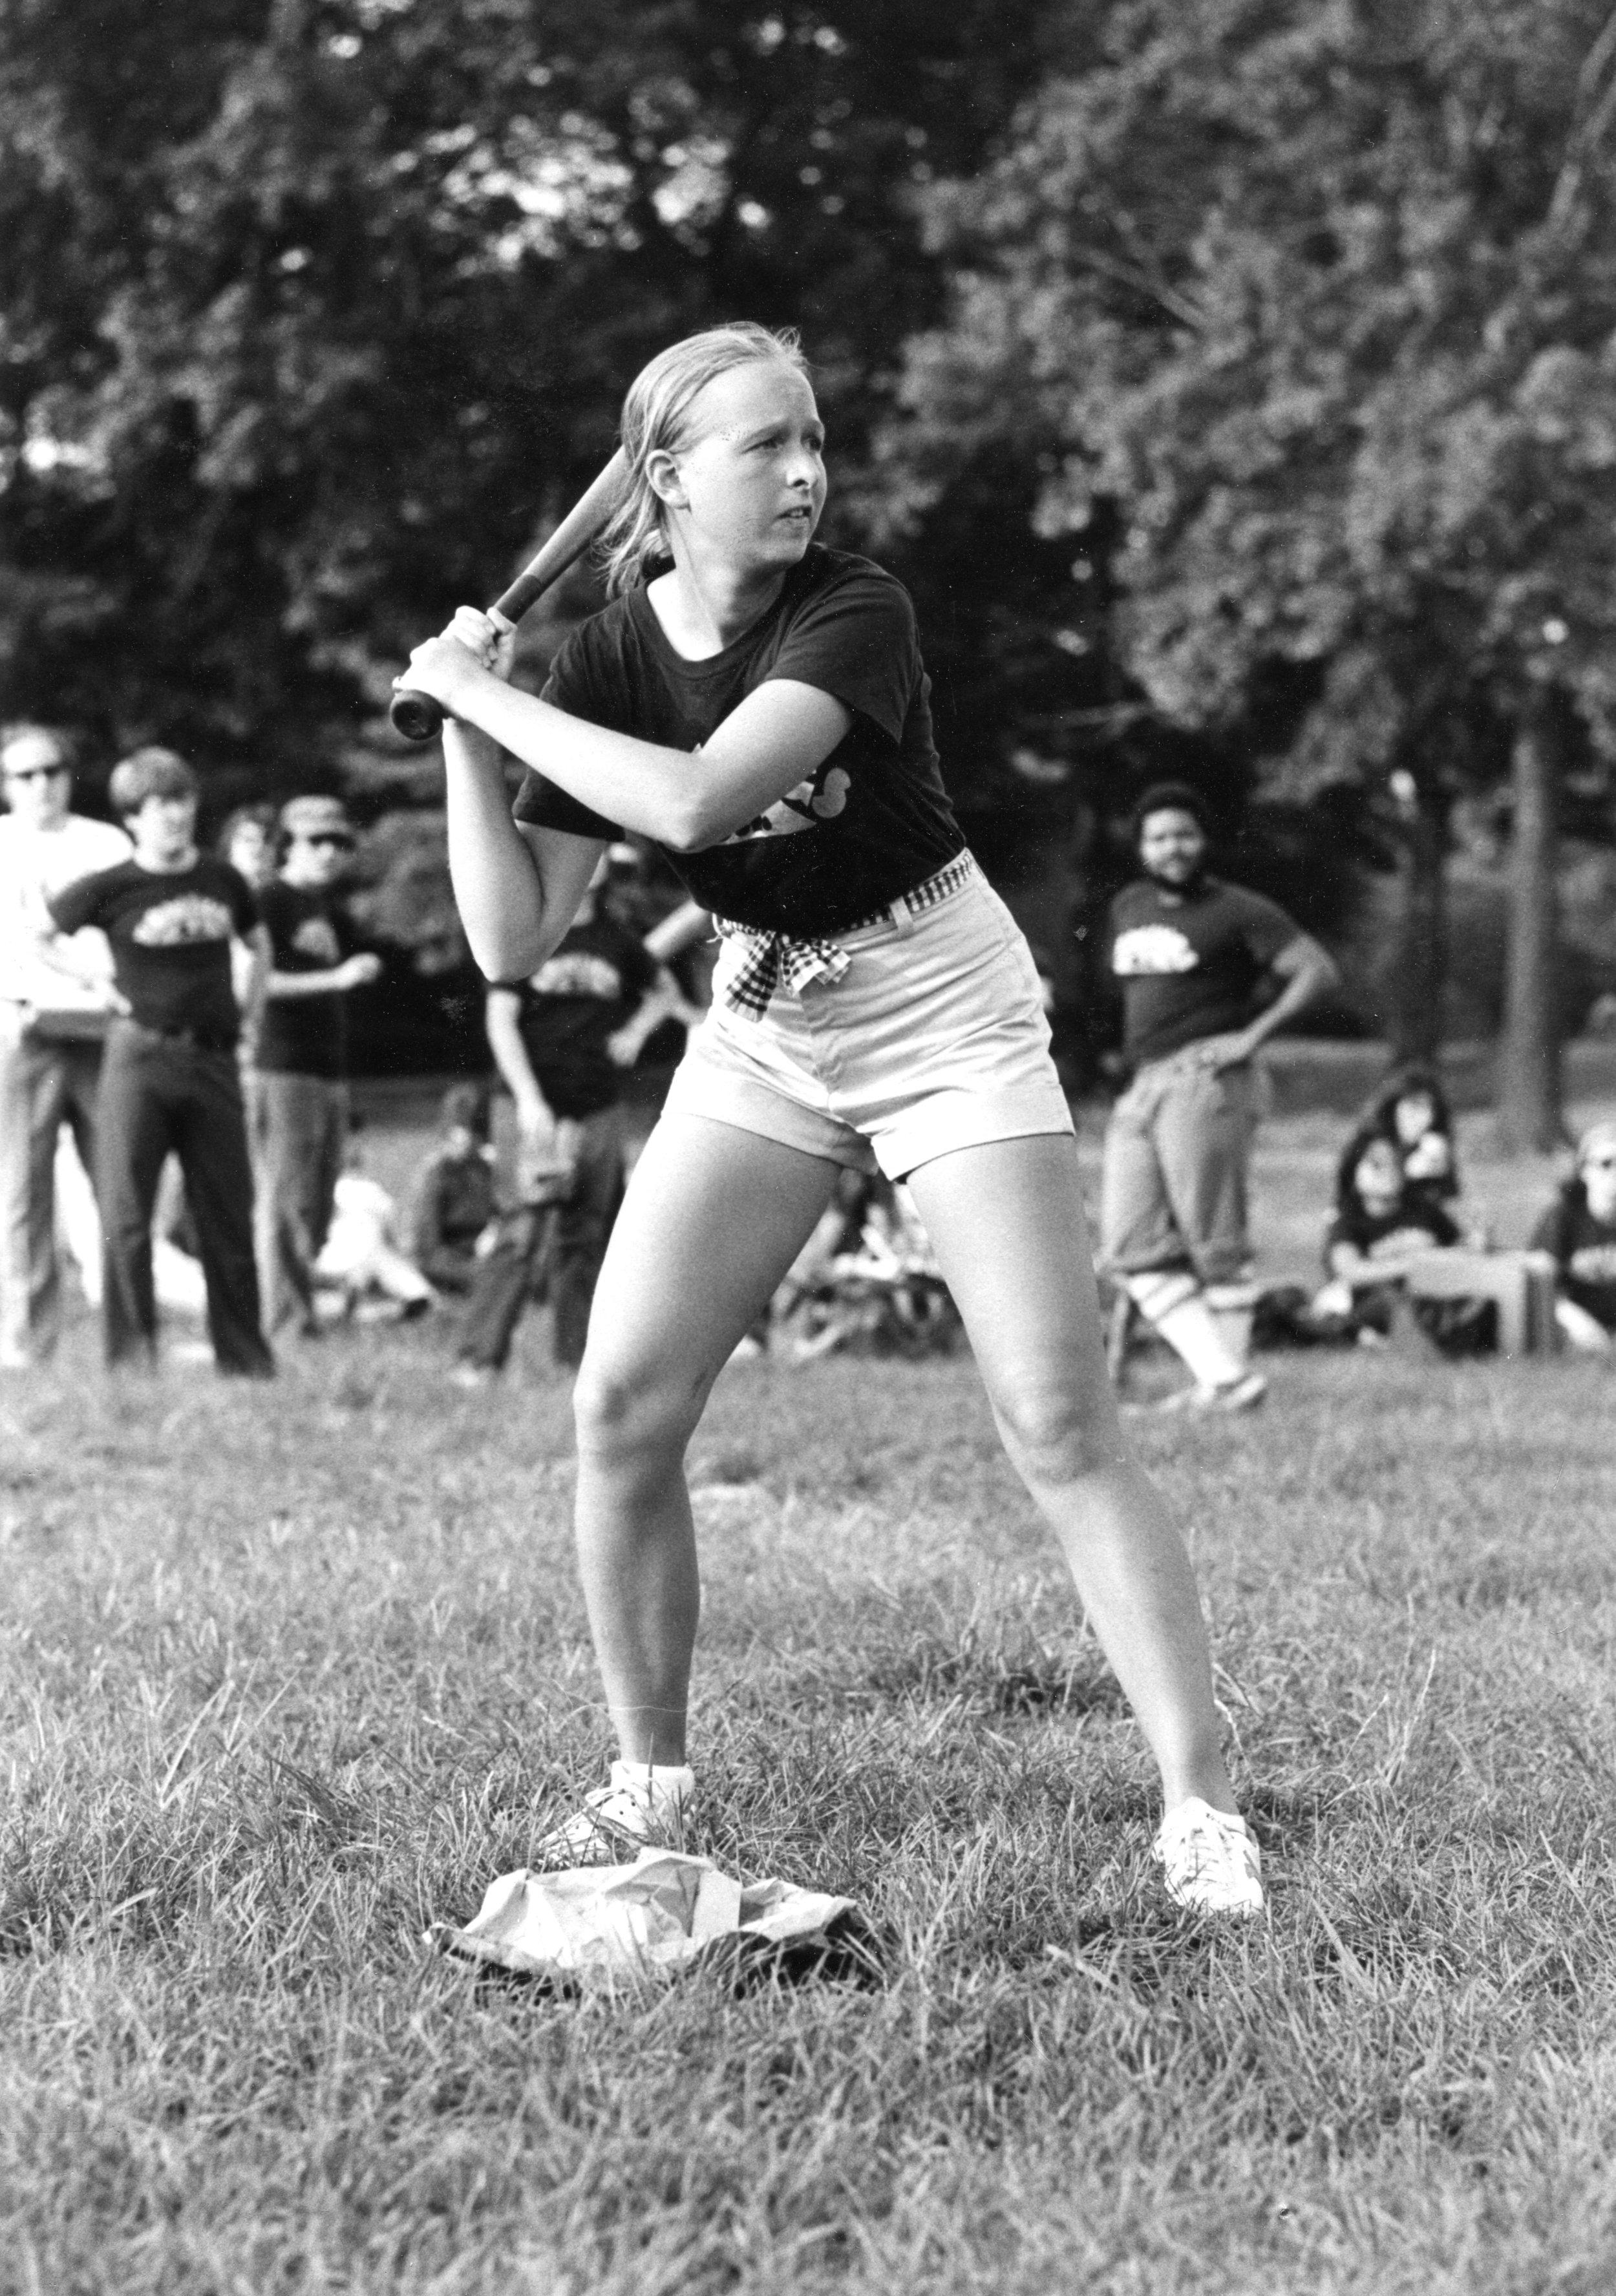 Me Softball Photo SI Team.jpg